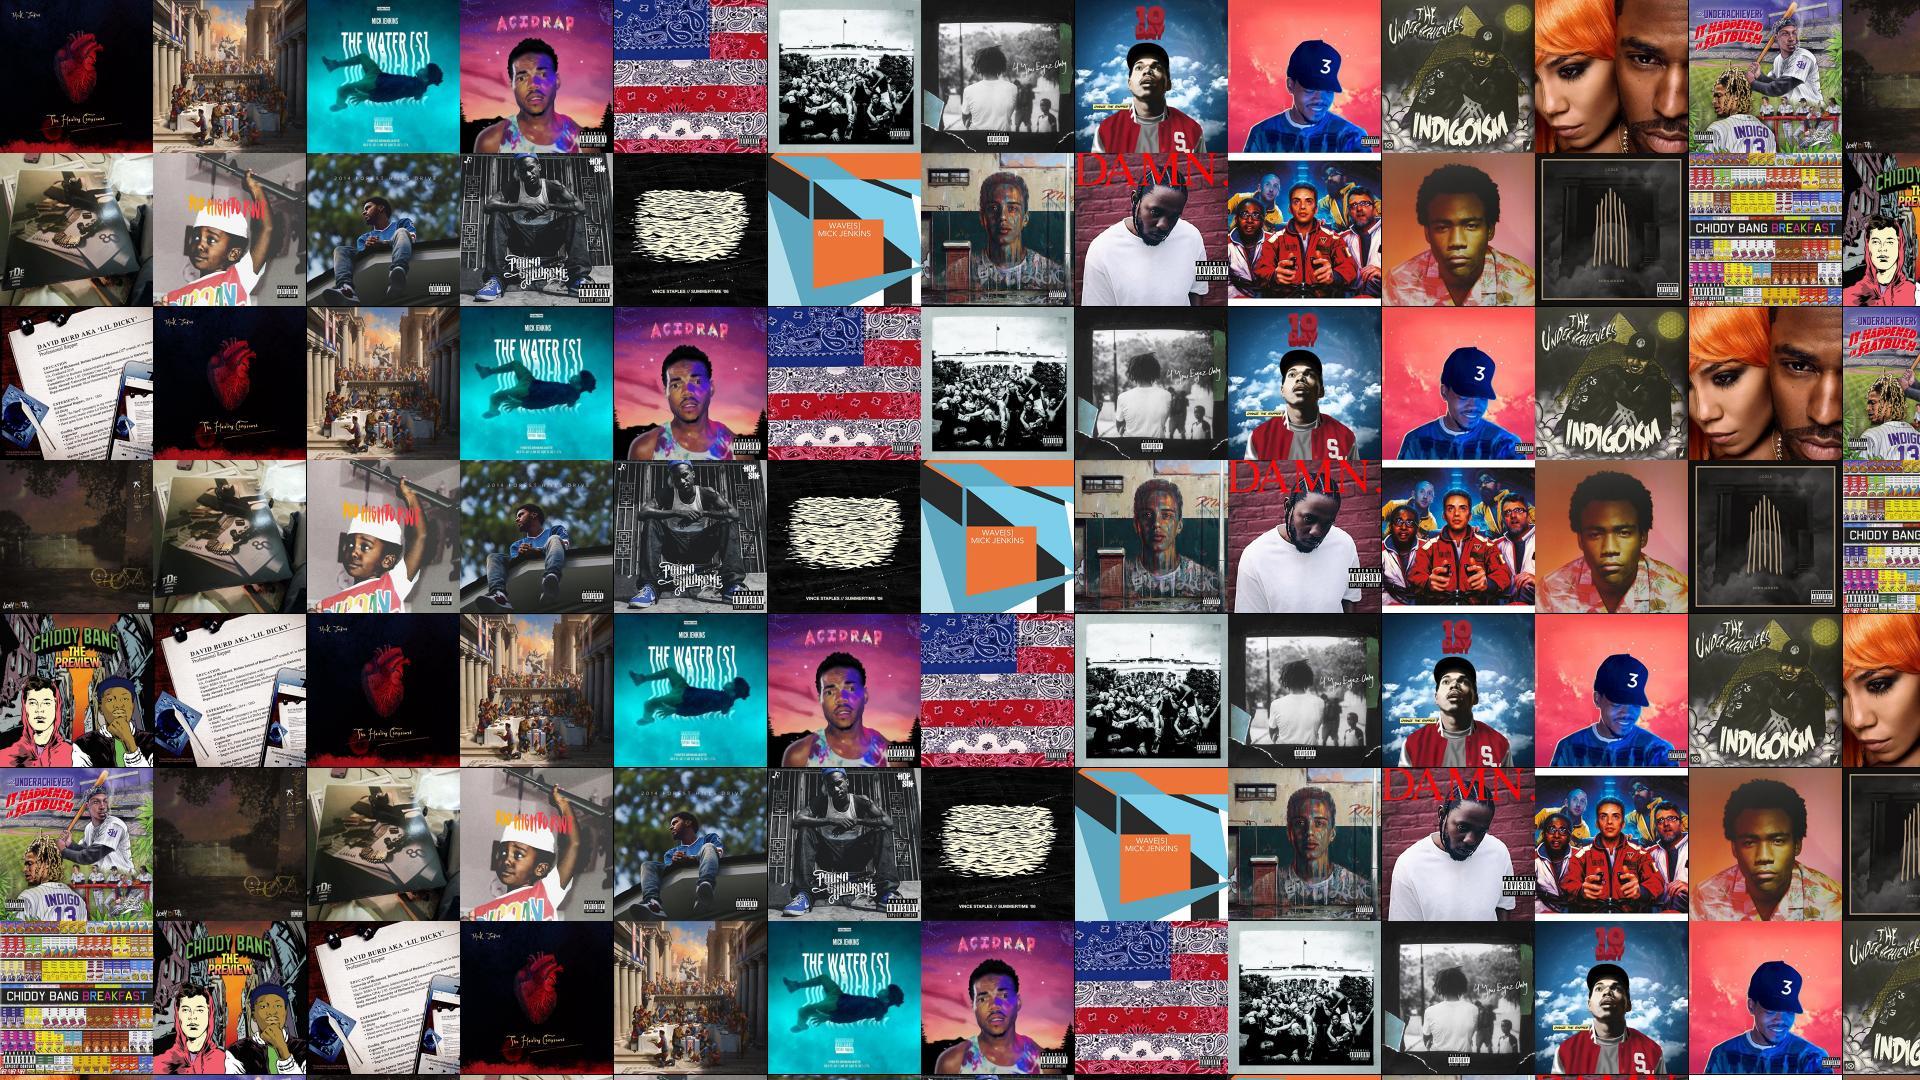 Mick Jenkins Logic Water Chance Rapper Wallpaper Tiled